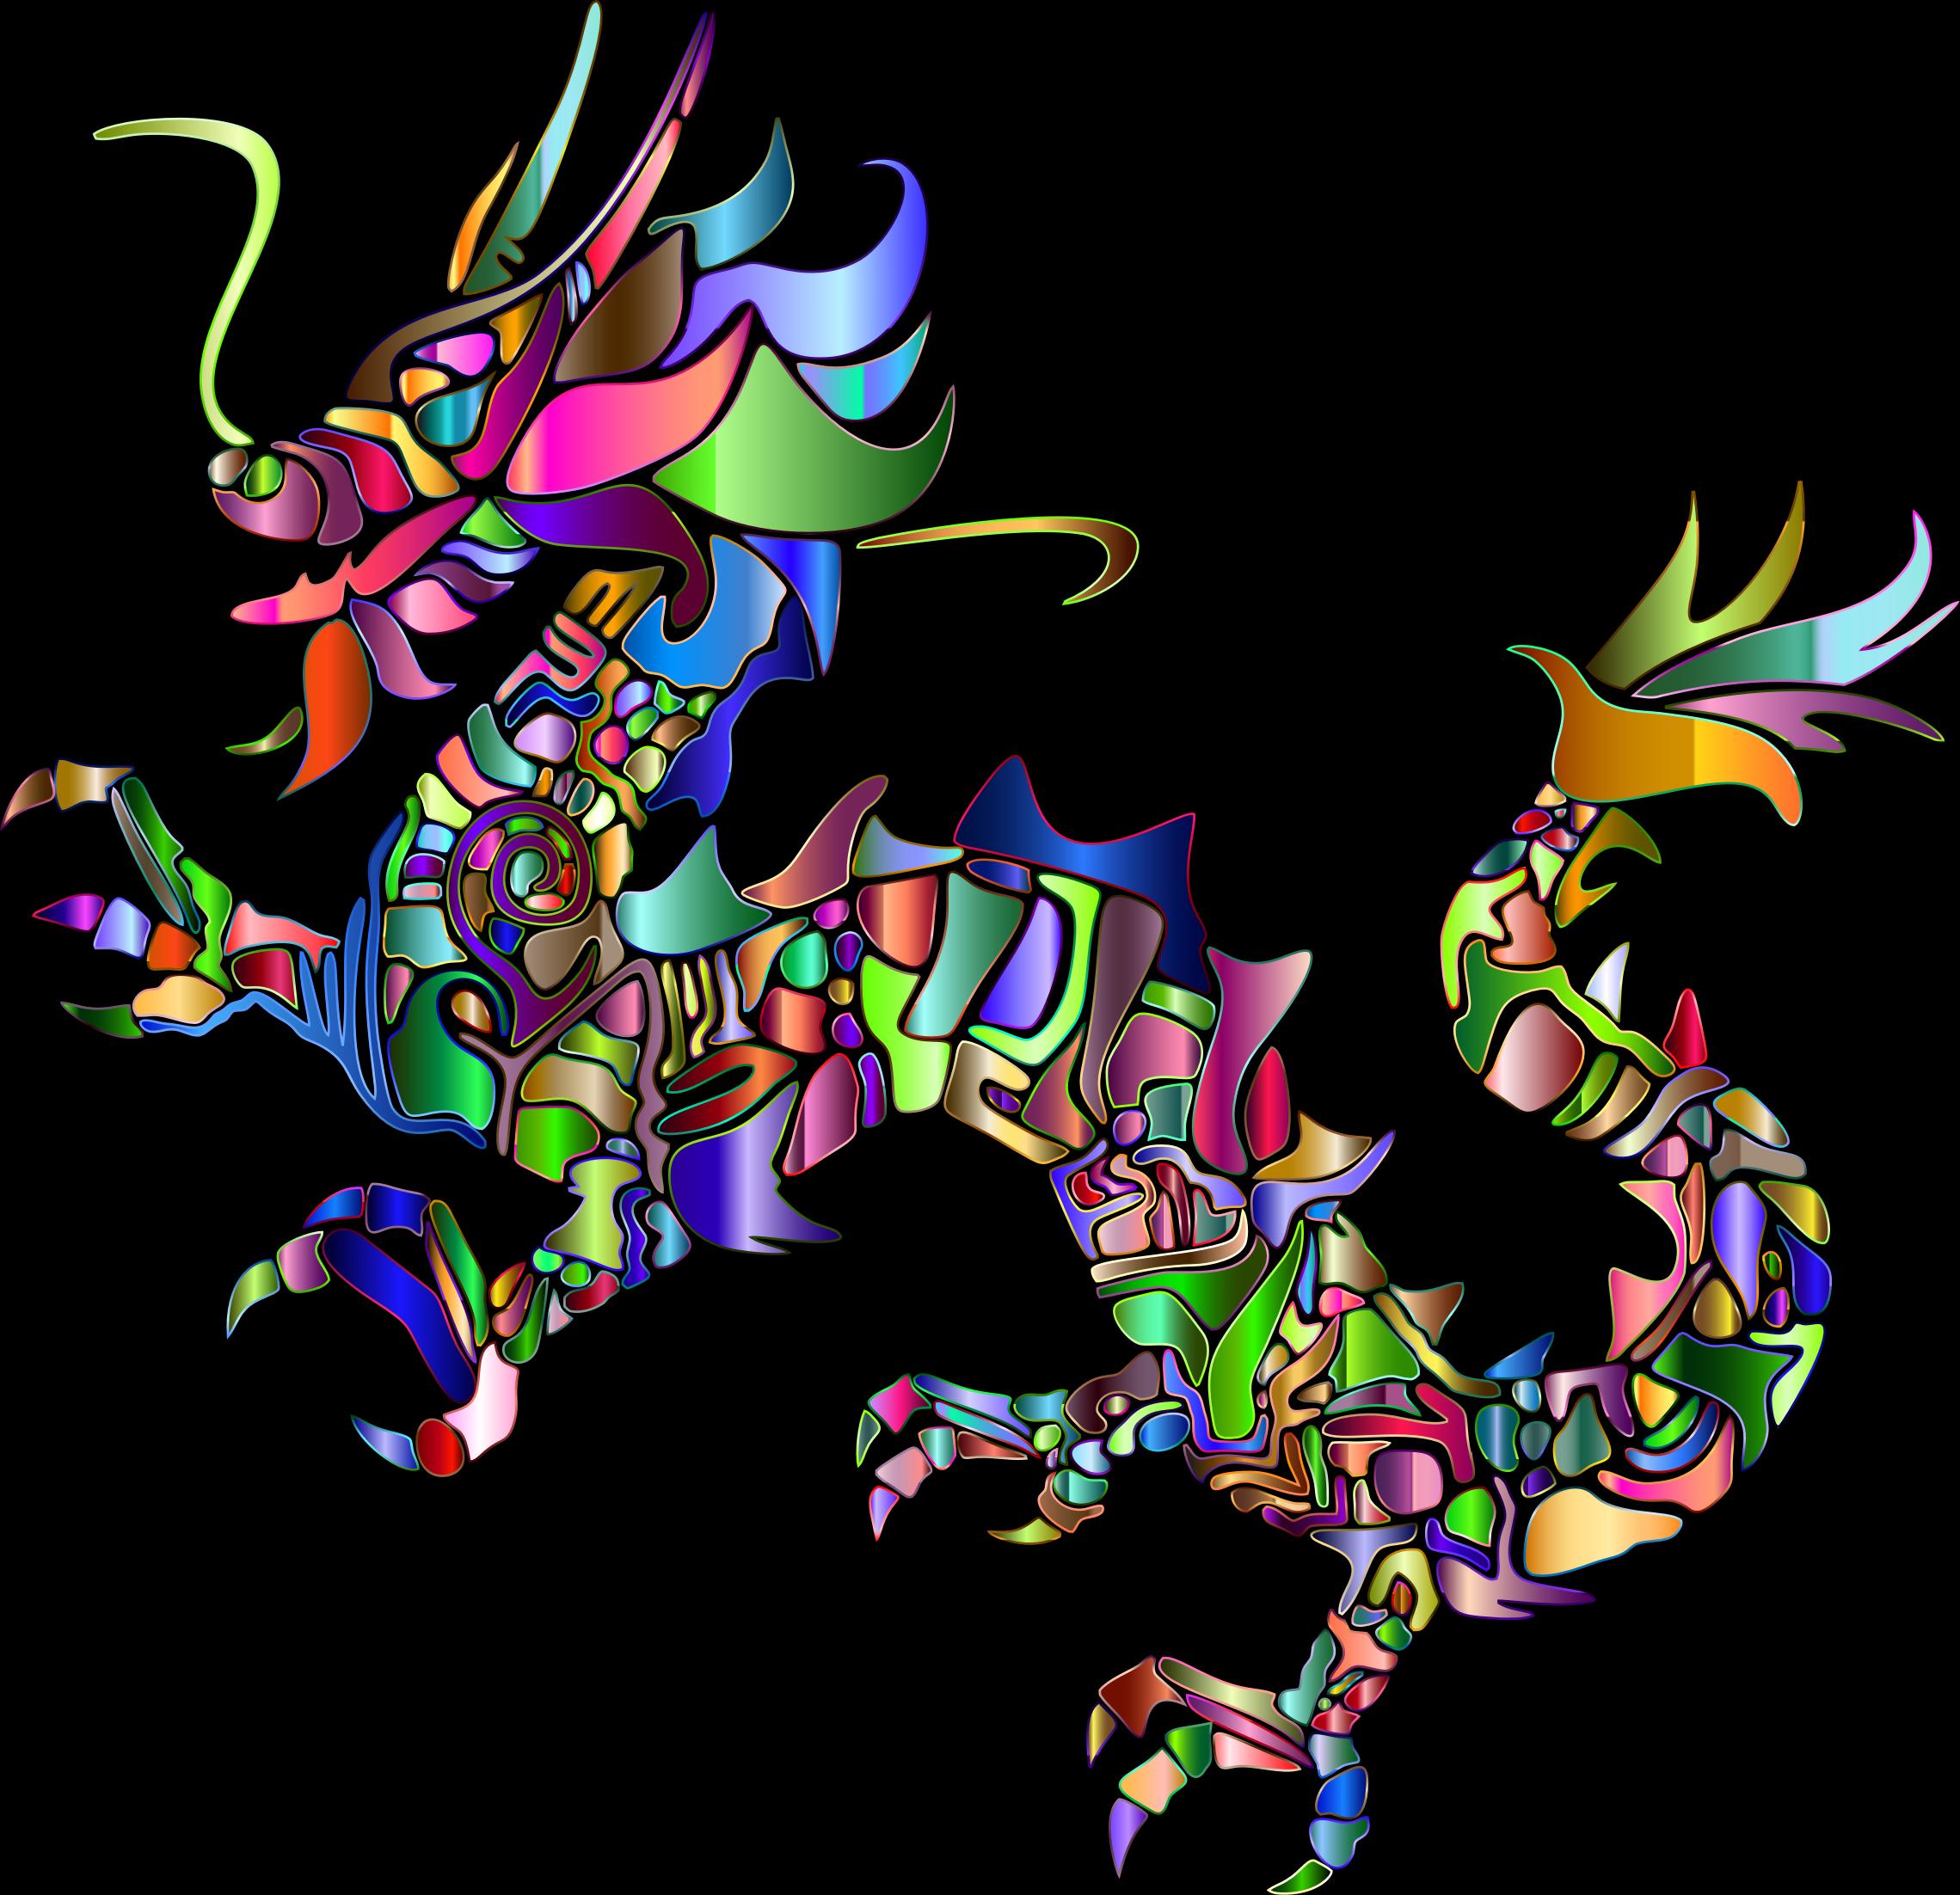 clipart chromatic tribal asian dragon silhouette 2 no monster clip art printable monster clipart jpeg